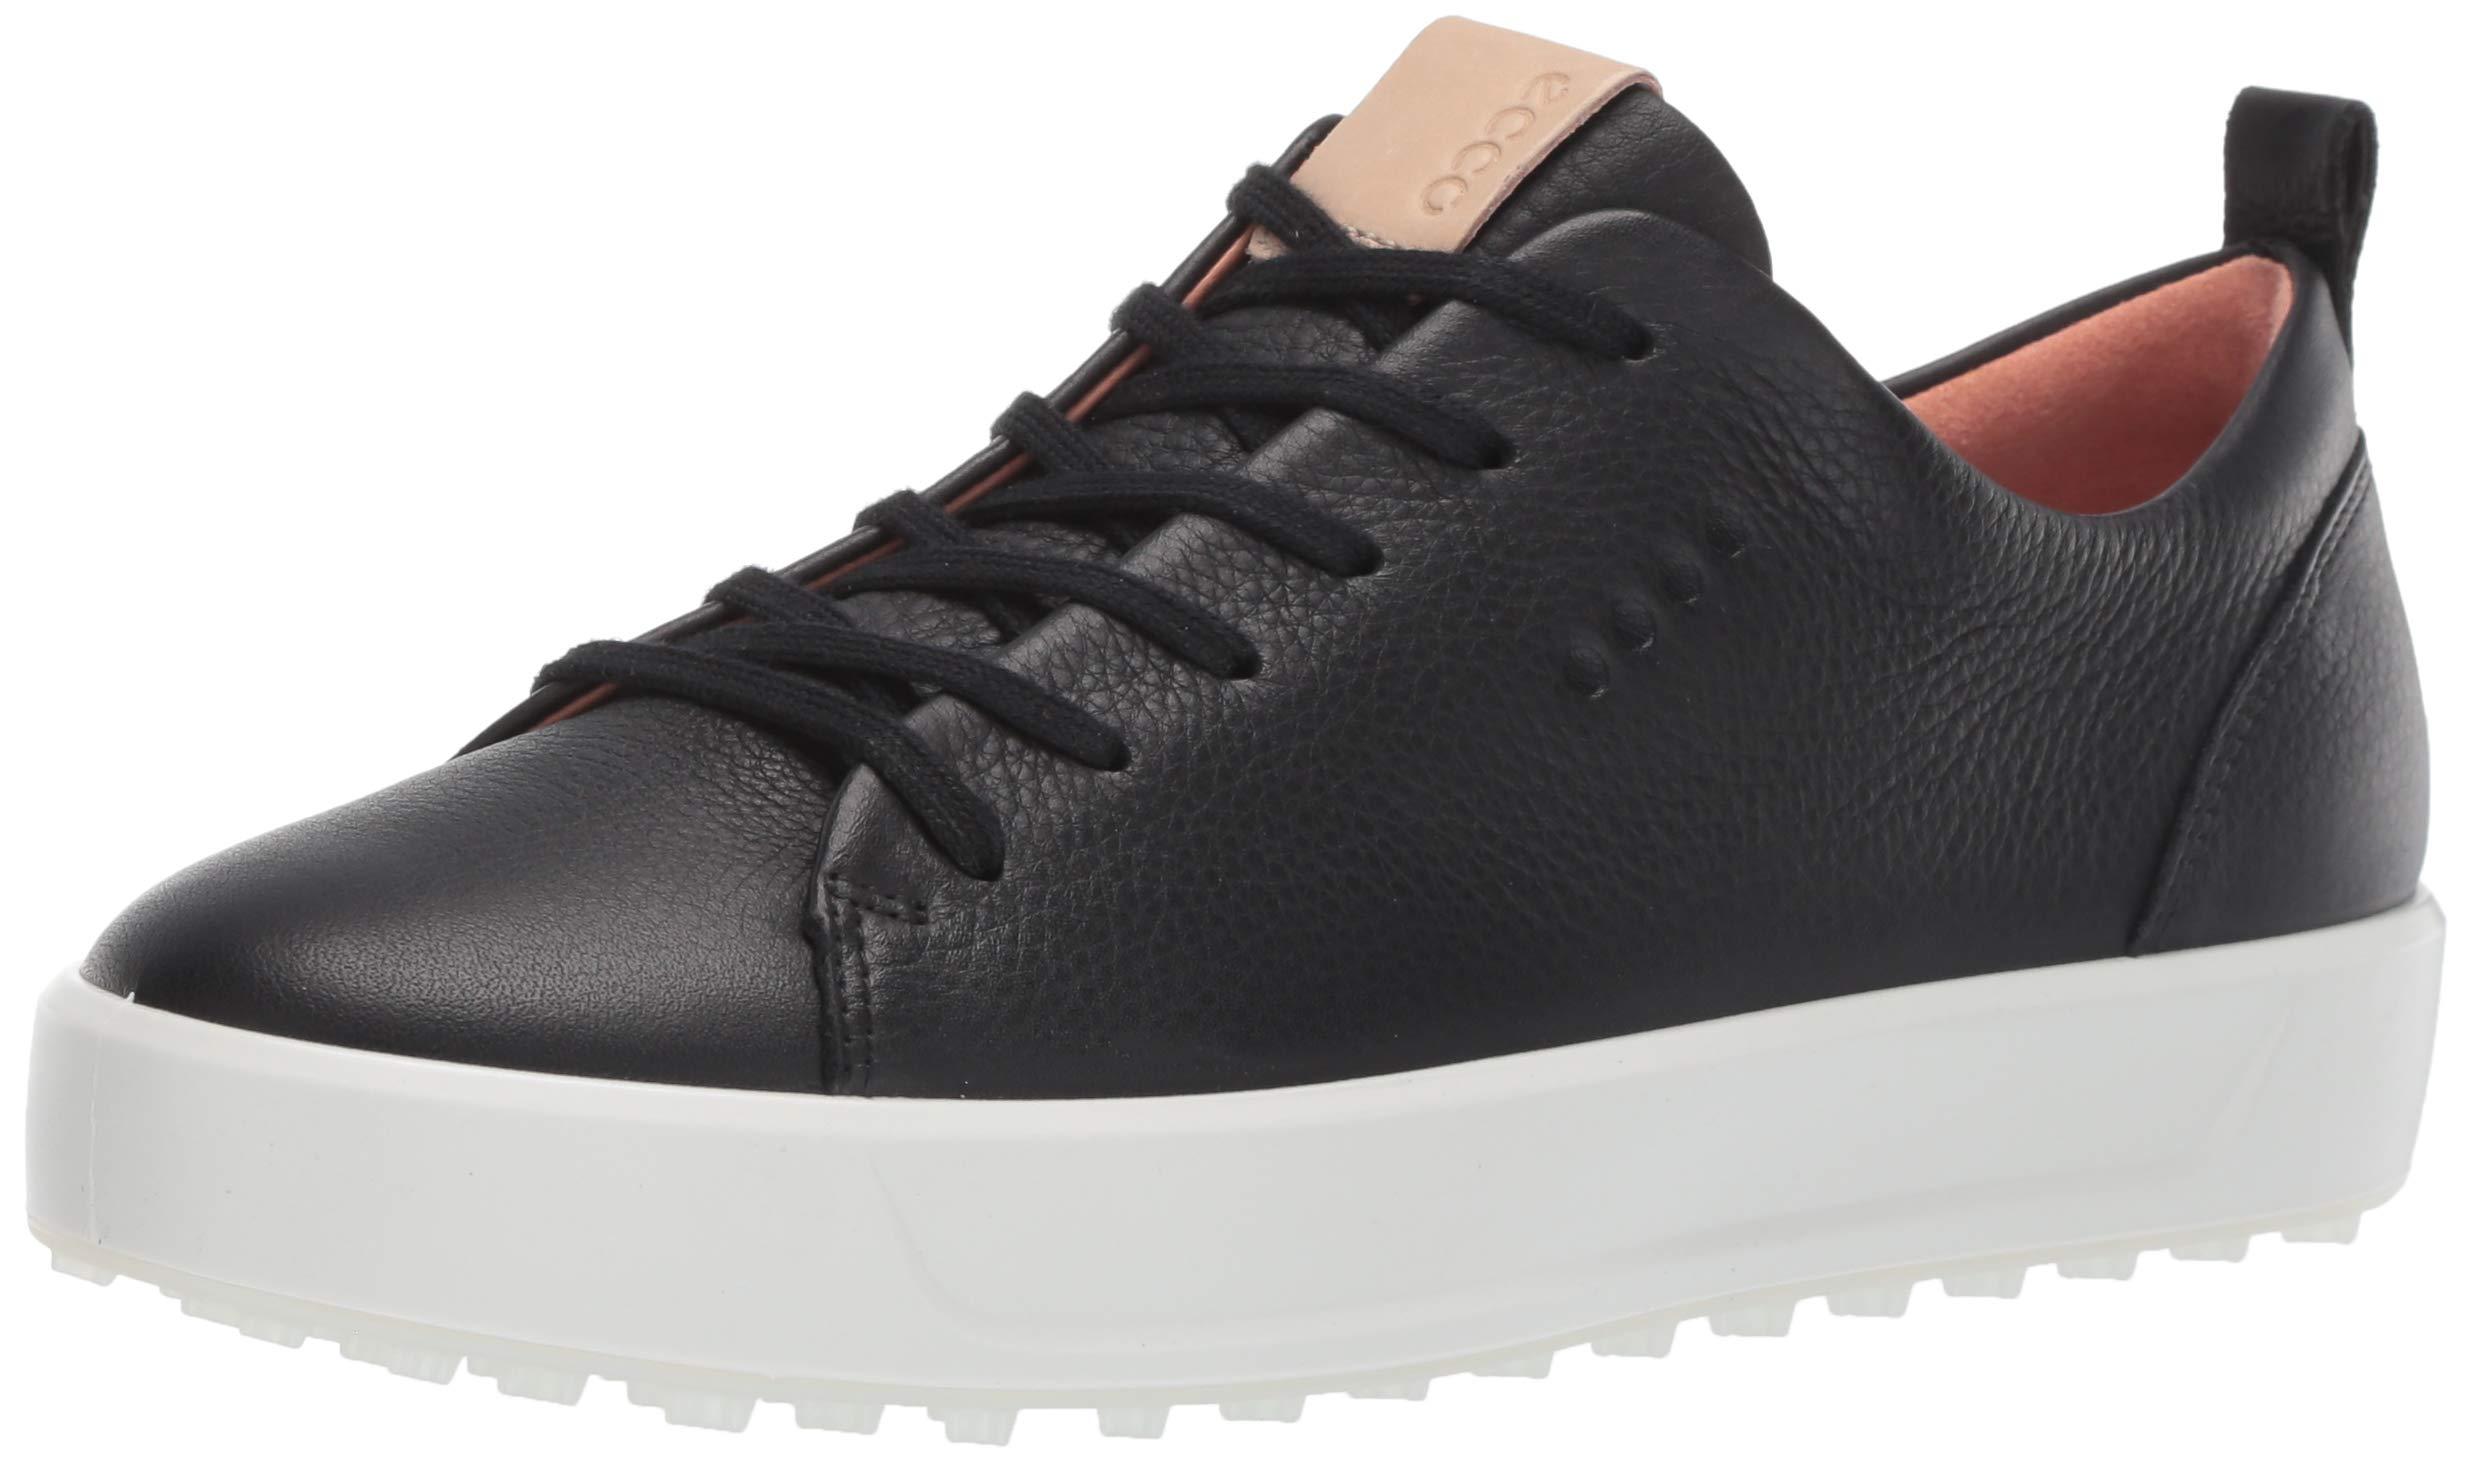 ECCO Women's Soft Low Hydromax Golf Shoe Black 36 M EU (5-5.5 US)